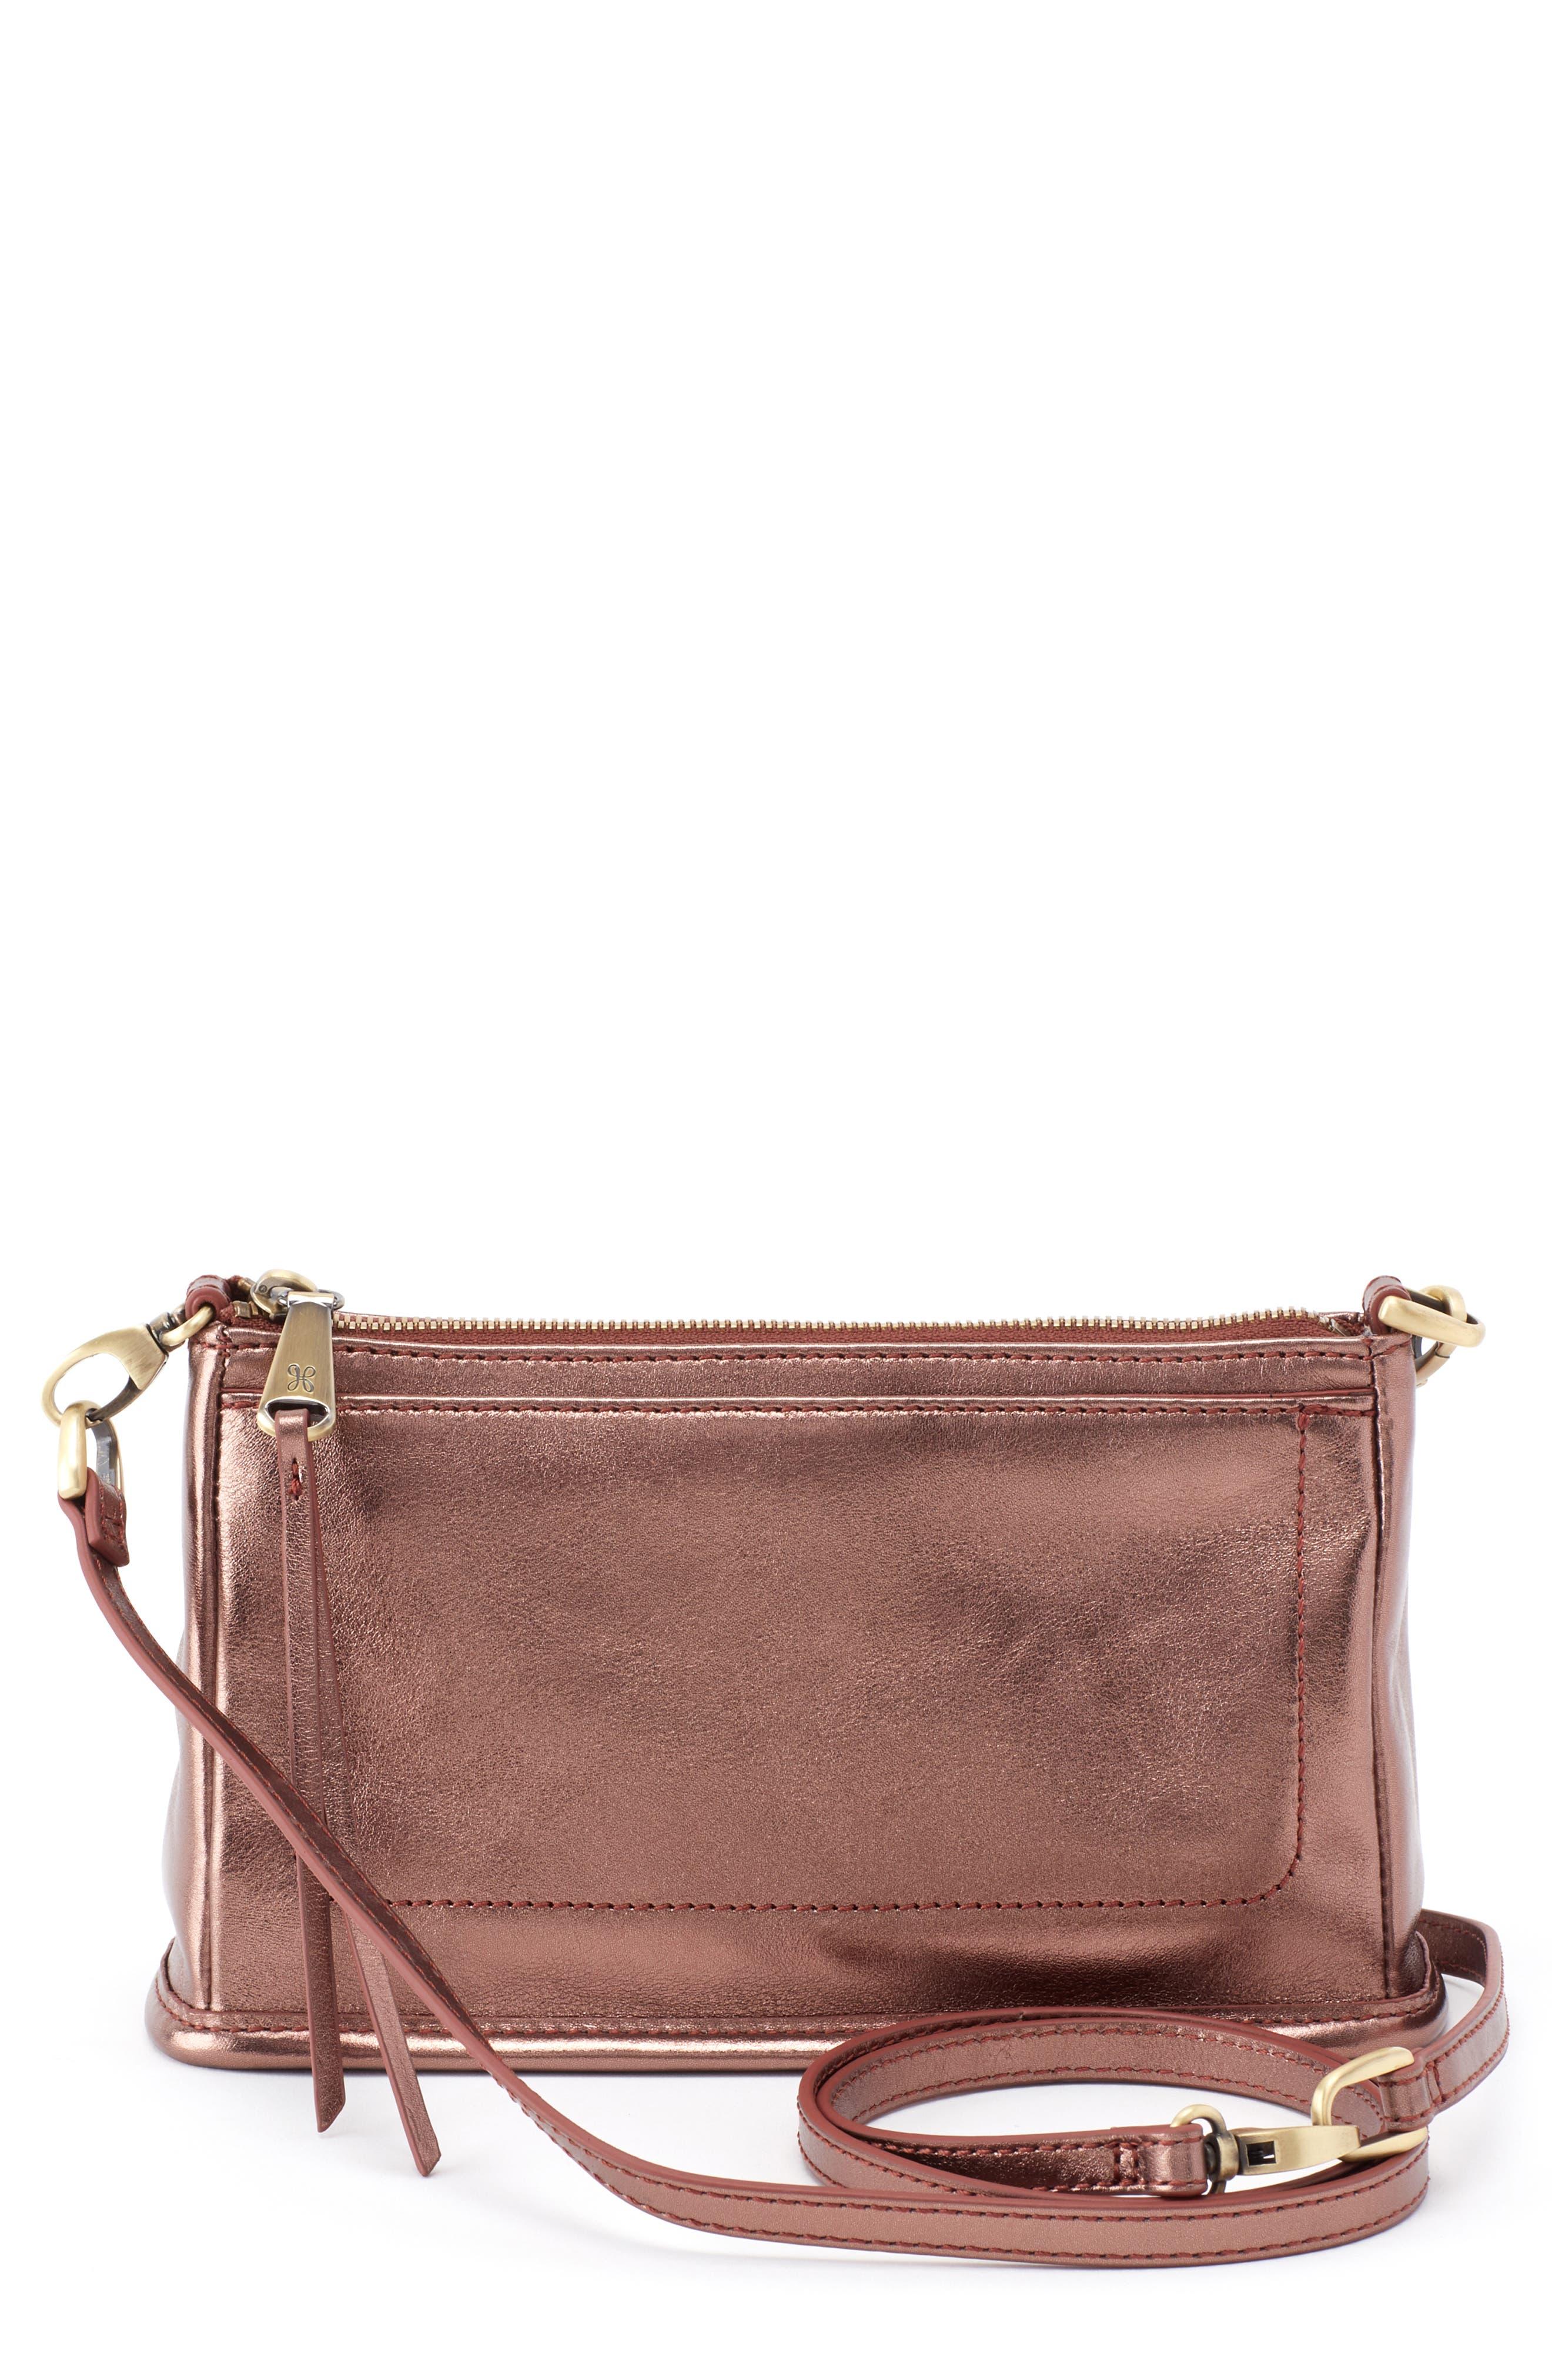 'Small Cadence' Leather Crossbody Bag,                         Main,                         color, Burnt Bronze